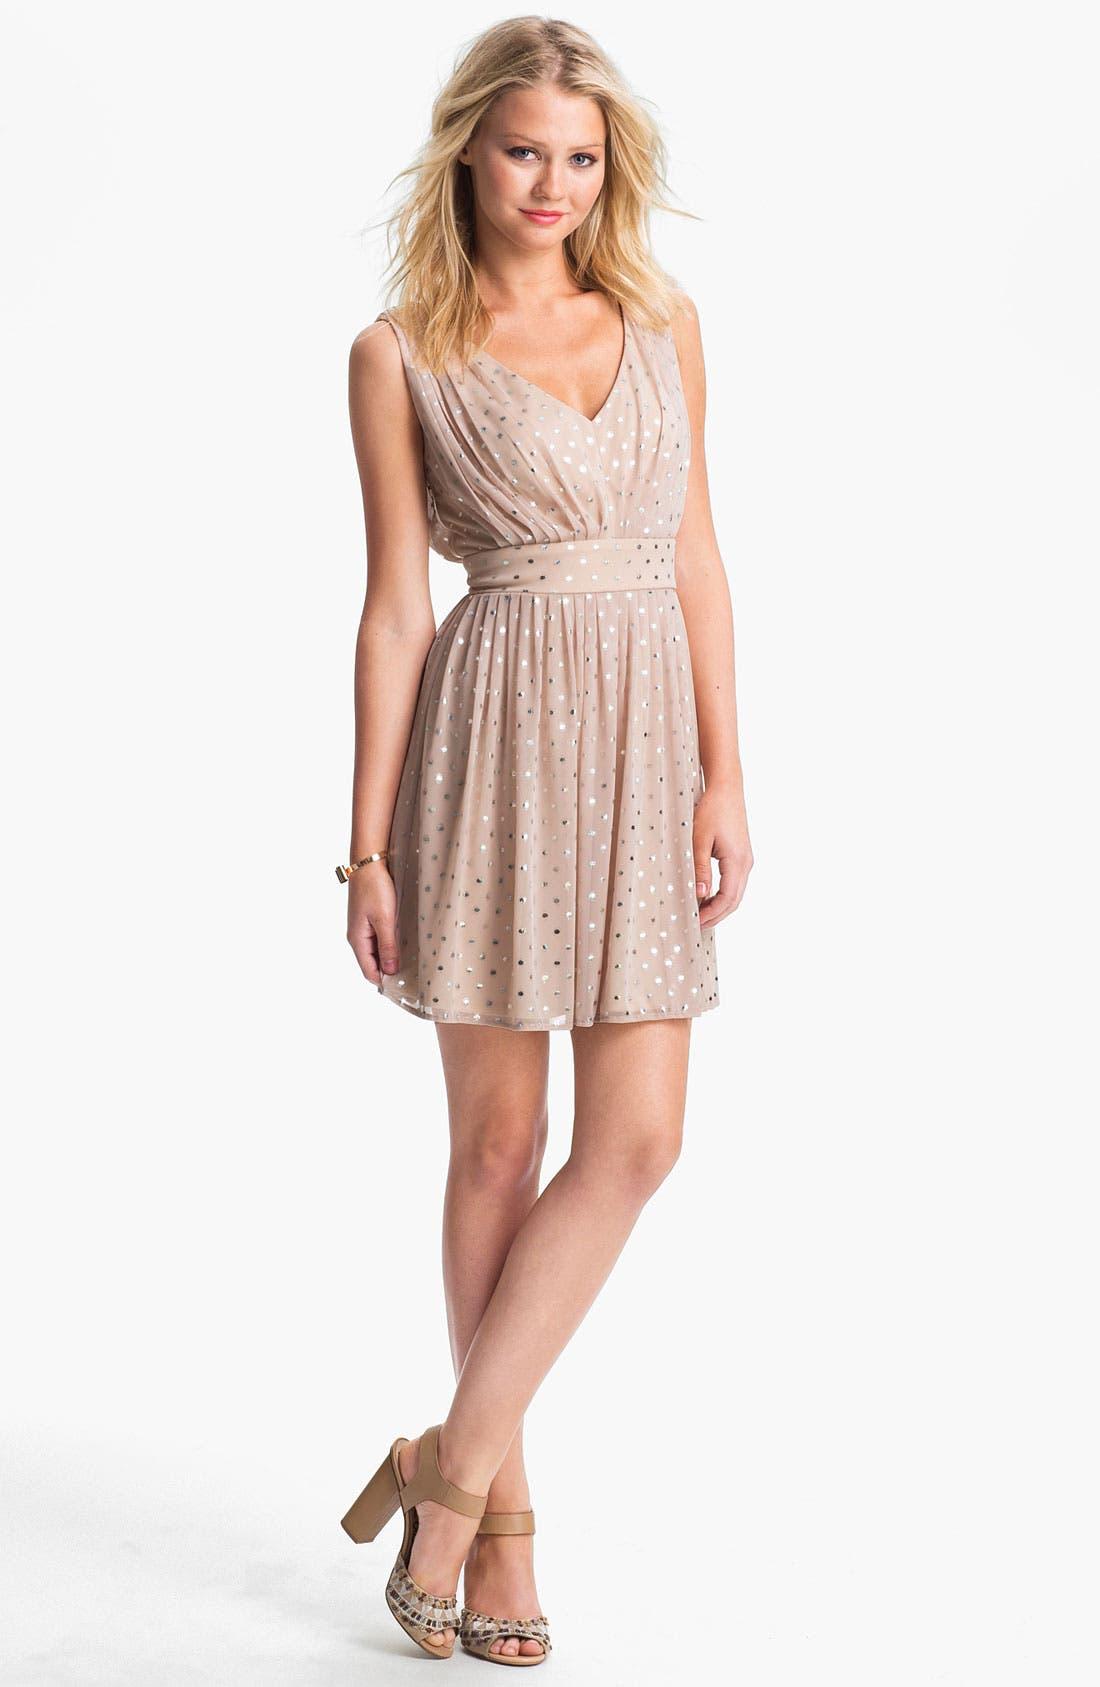 Alternate Image 1 Selected - As U Wish Foil Dot Party Dress (Juniors)